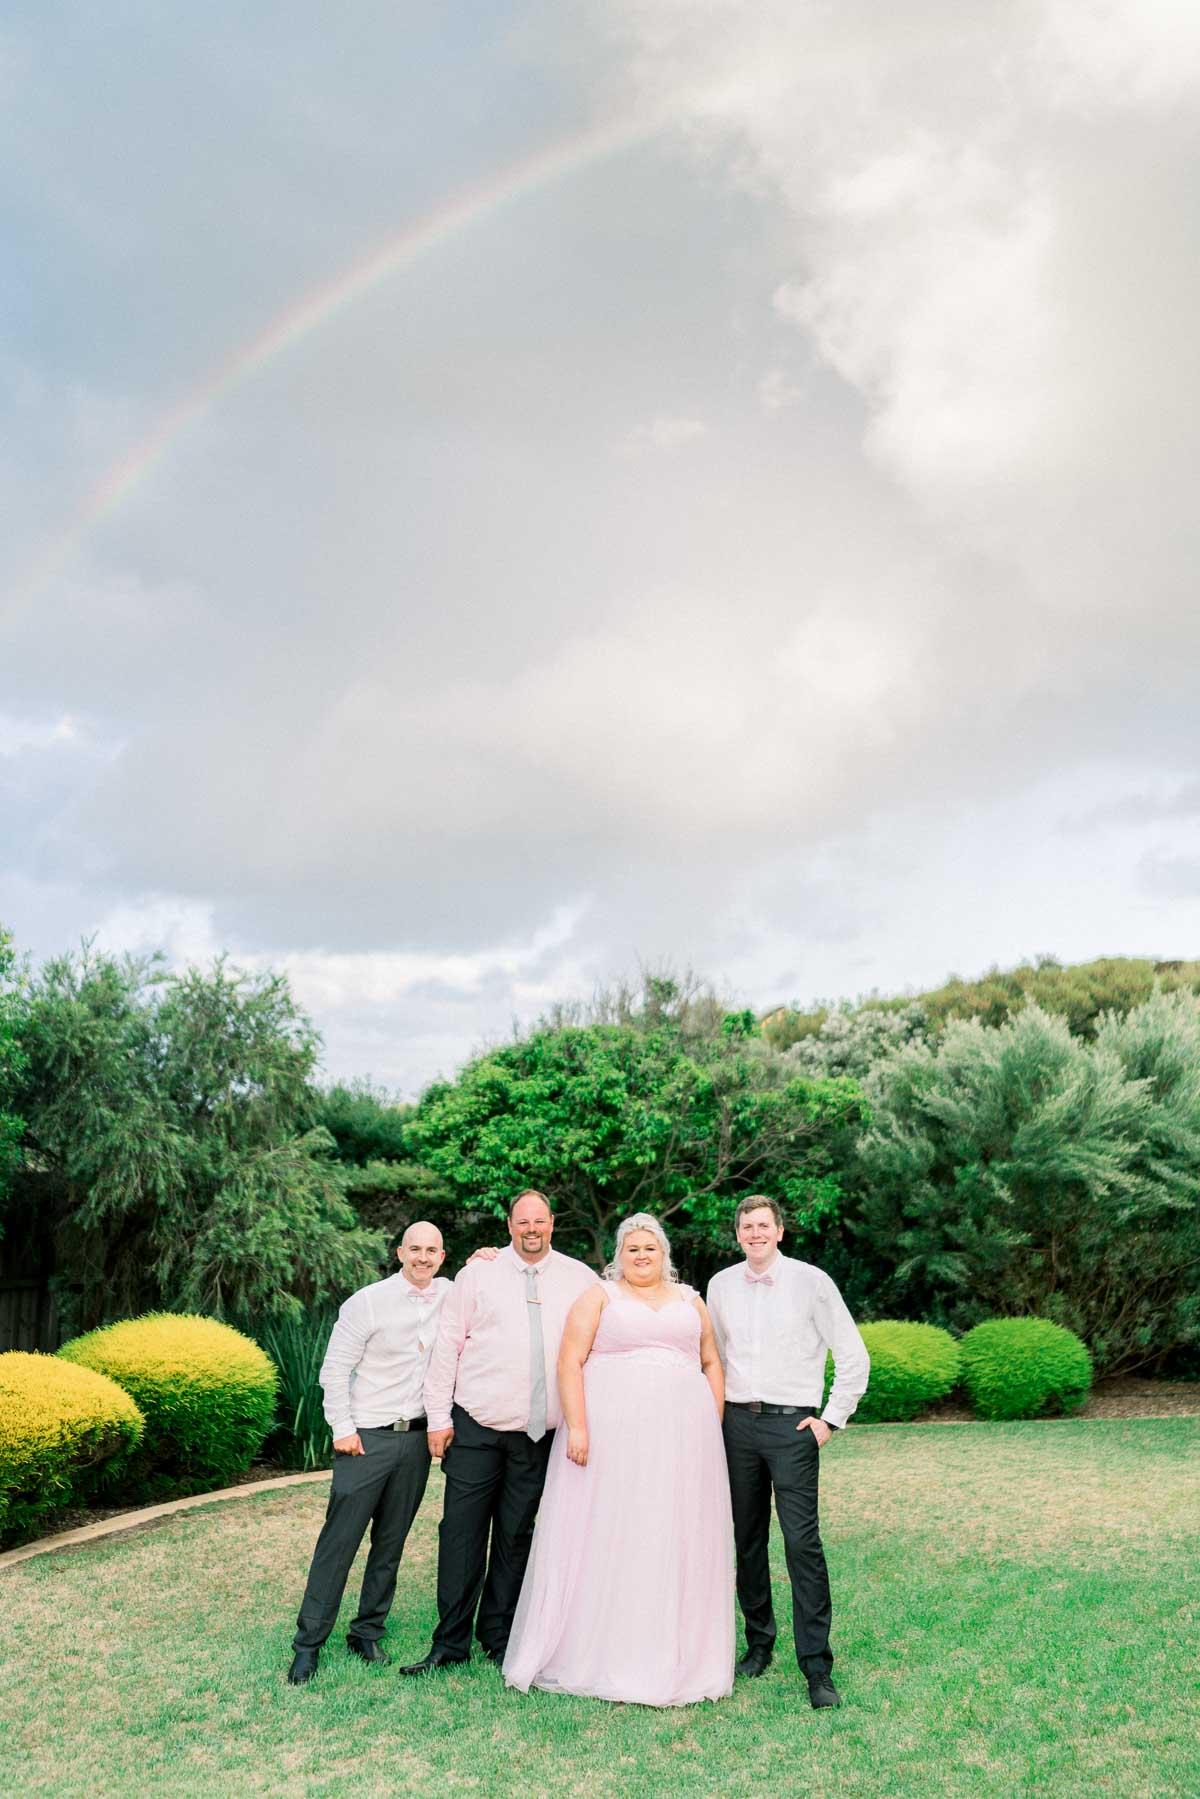 mt-eliza-mornington-peninsula-backyard-wedding-heart+soul-weddings-allison-matt-04005.jpg